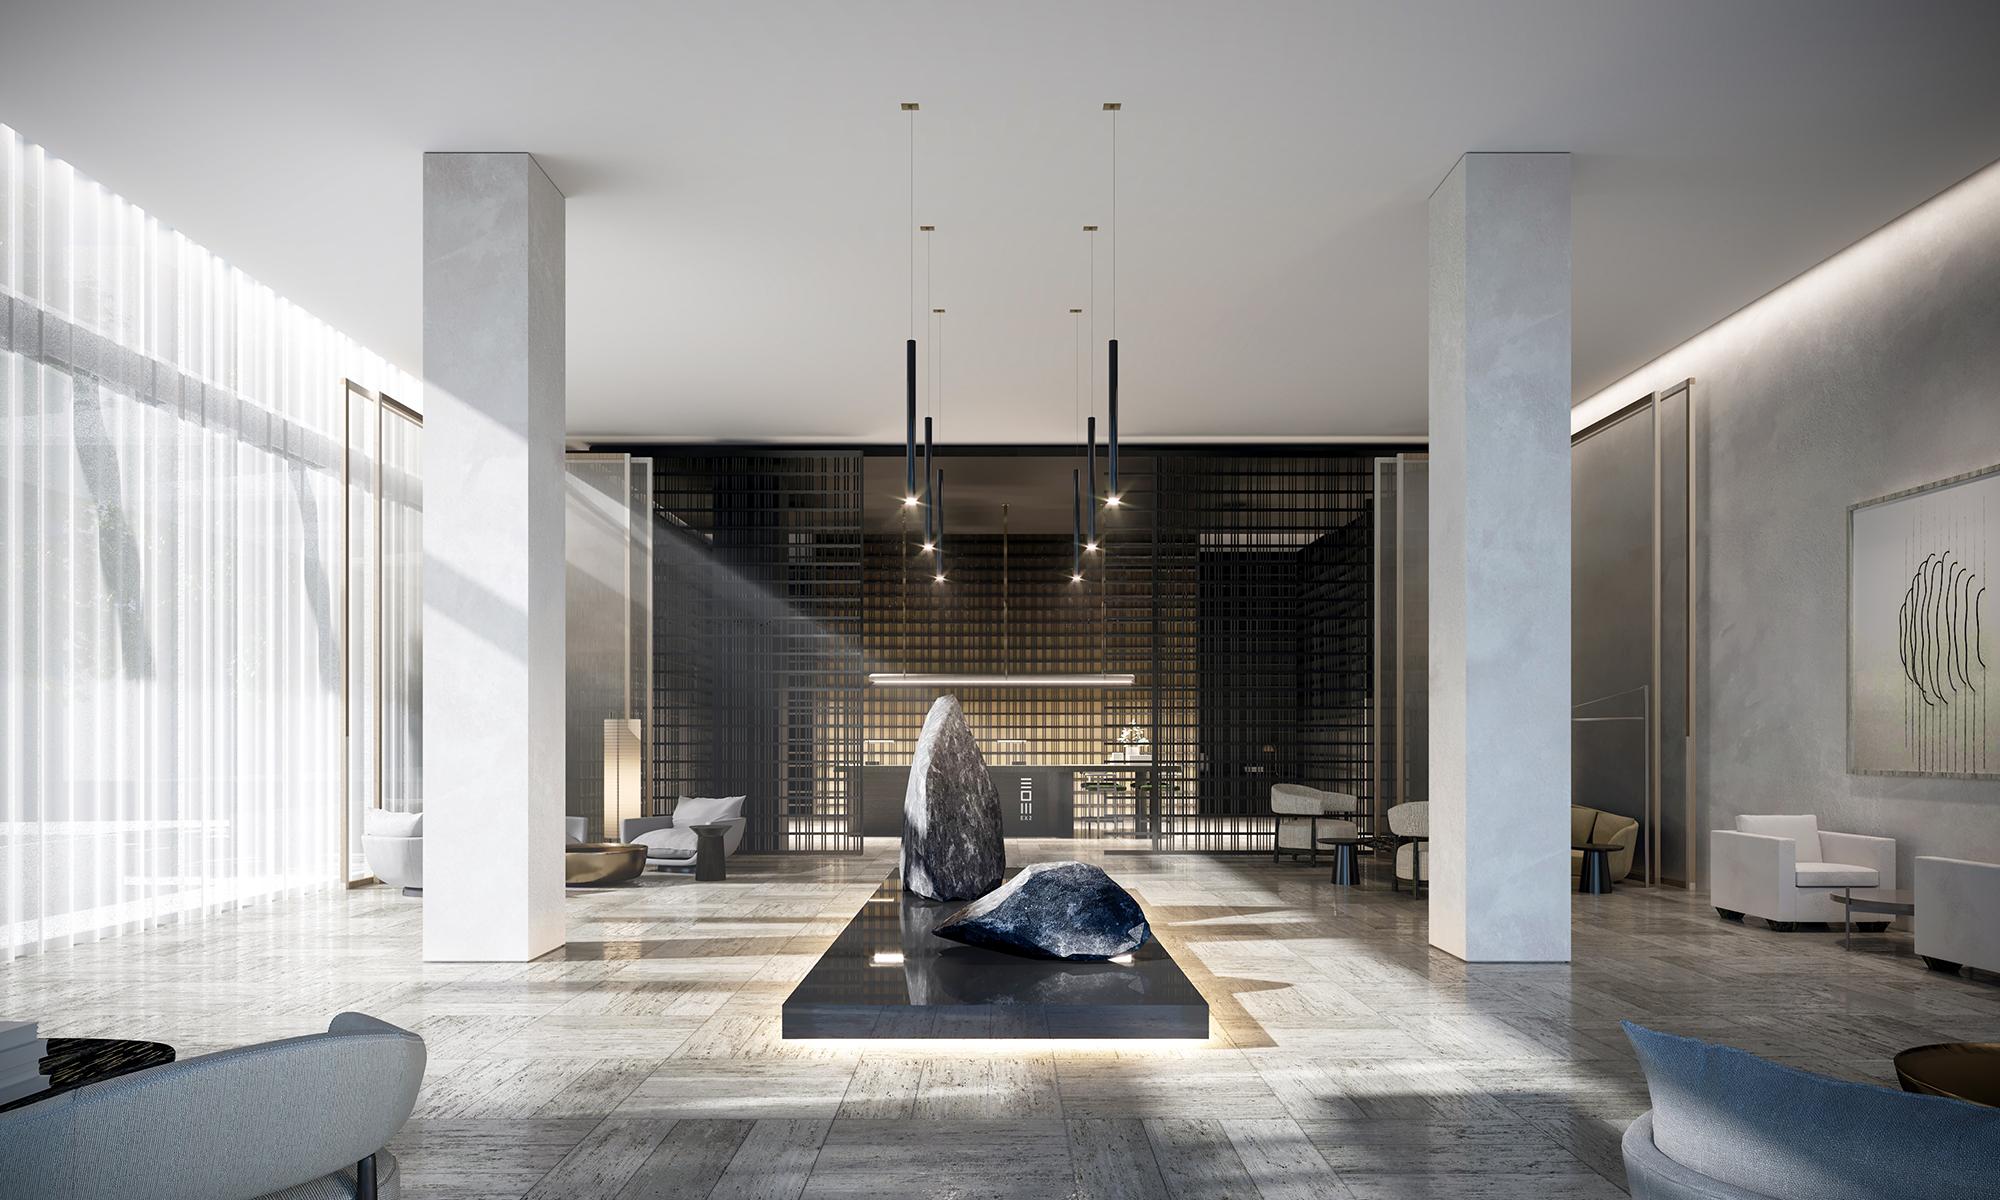 exchange-district-mississauga-square-one-condos-ex2-lobby